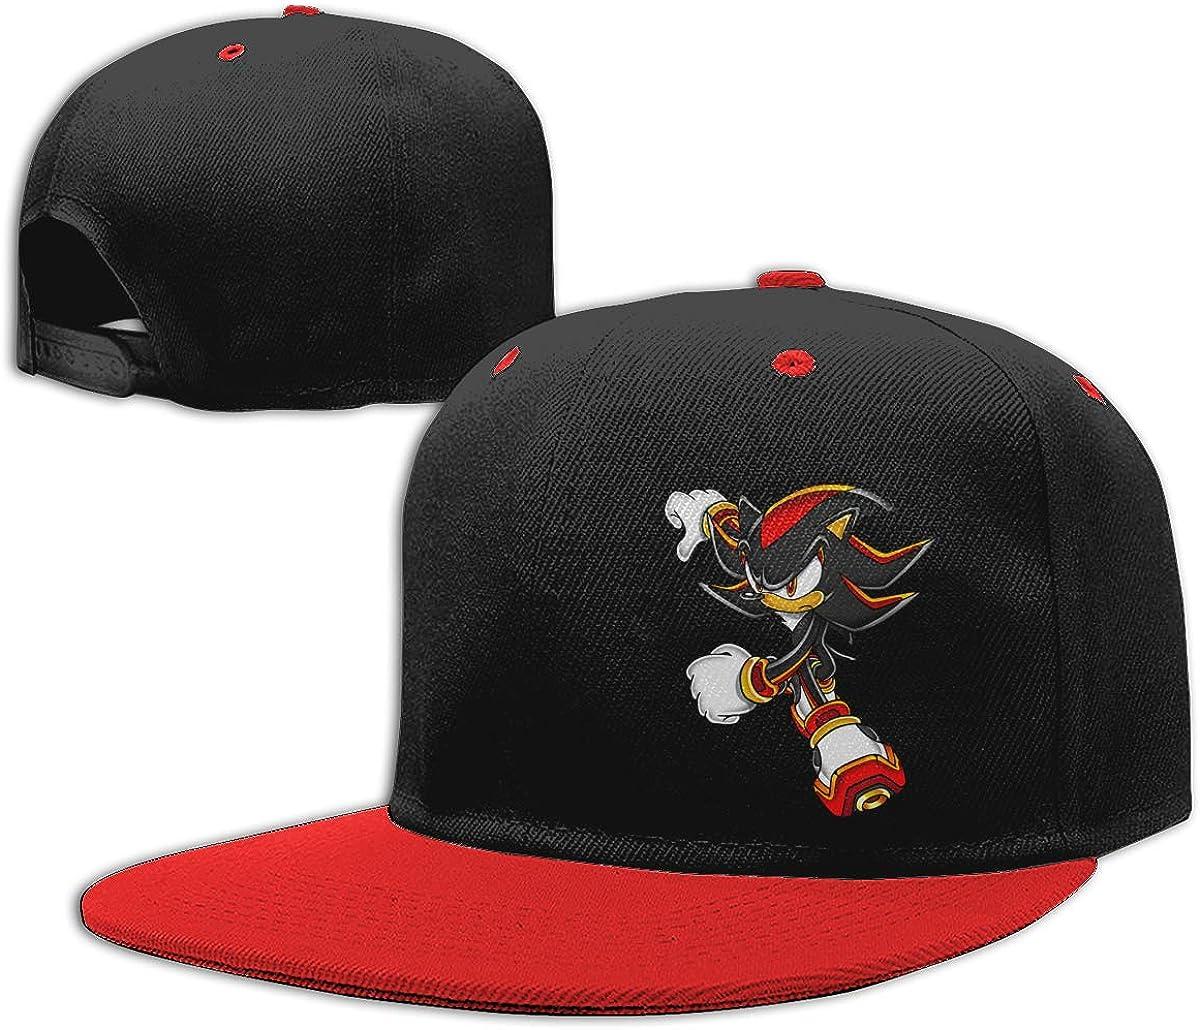 Orayh Kids Cotton Baseball Cap Sha-Dow The Hedg-ehog Adjustable Hip-Hop Hat Outdoor Trucker Cap